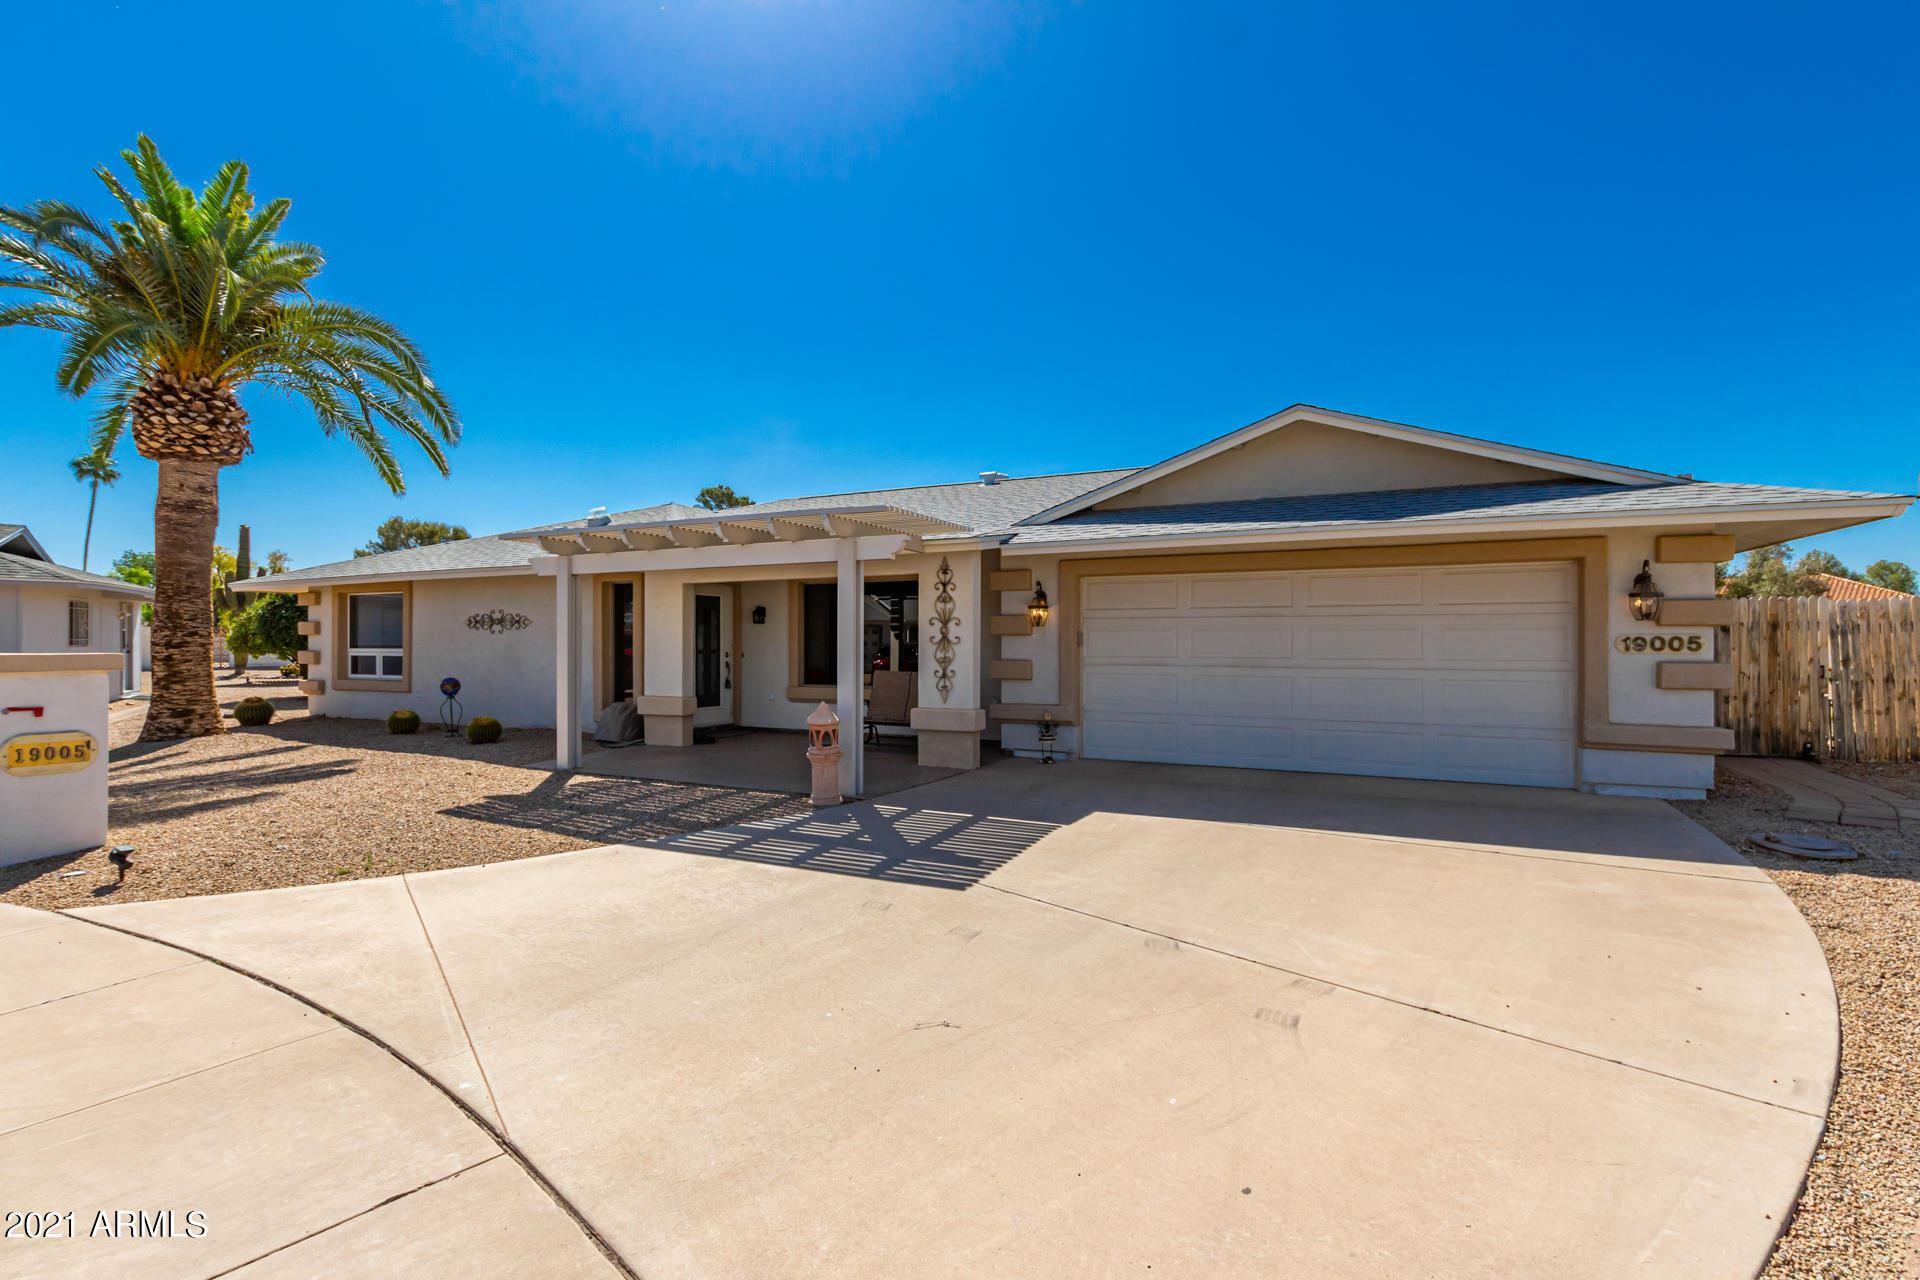 Photo of 19005 N 99TH Drive, Sun City, AZ 85373 (MLS # 6231488)